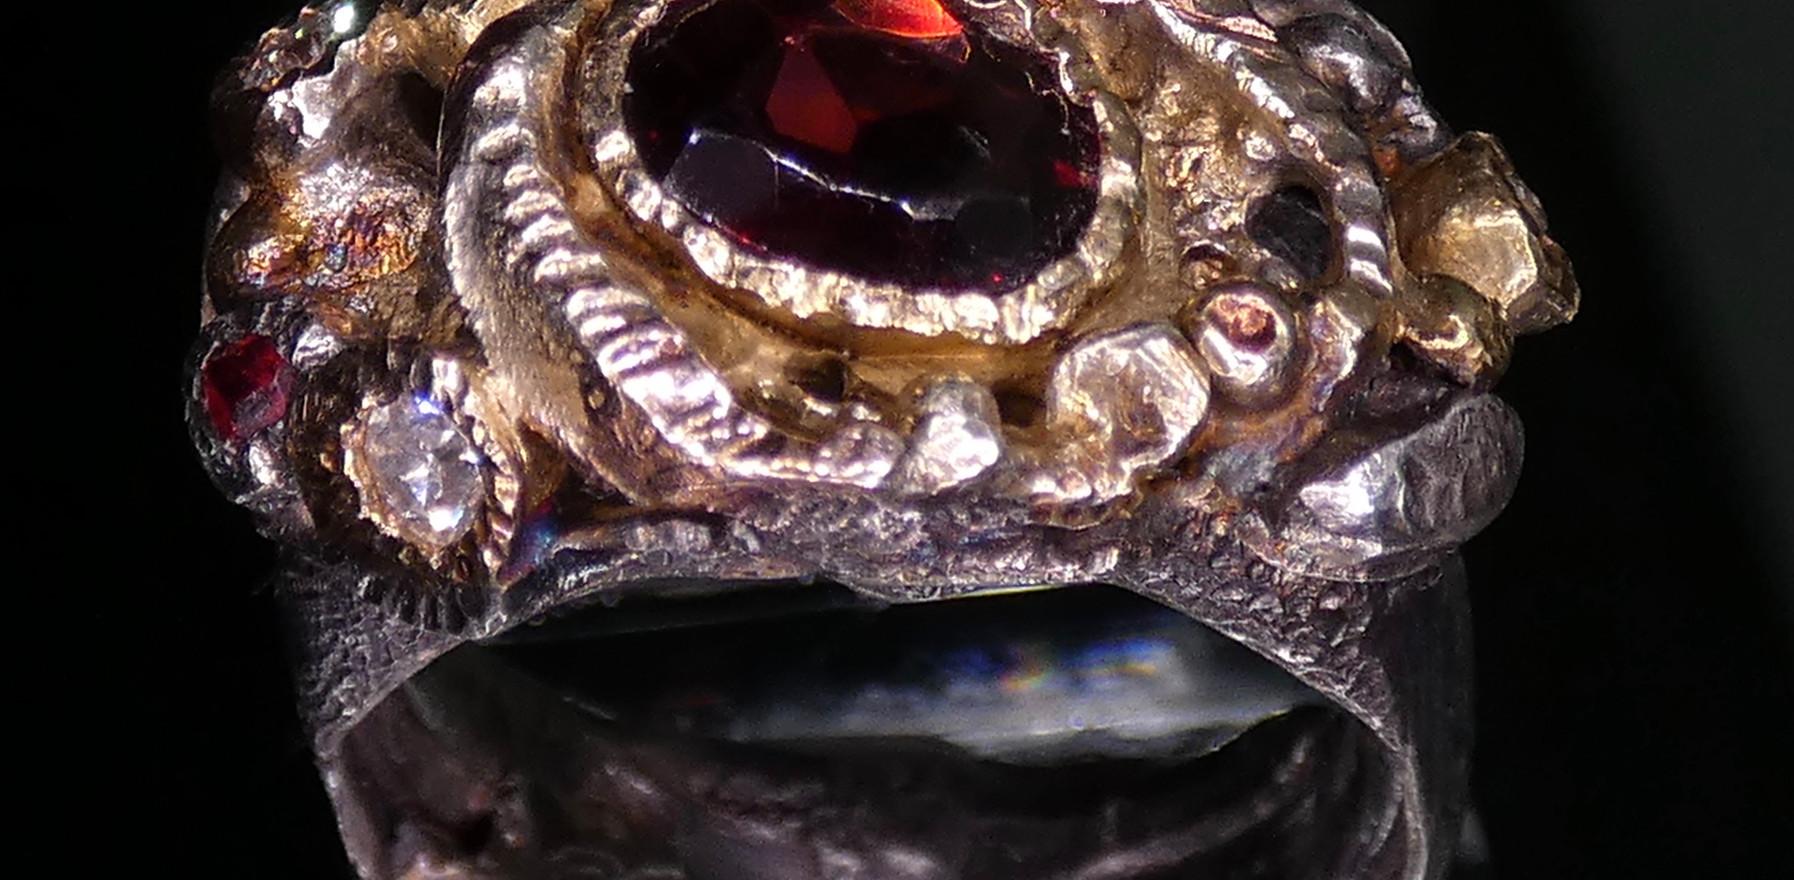 Commission Piece -Mixed carat gold, silver, diamonds & garnet